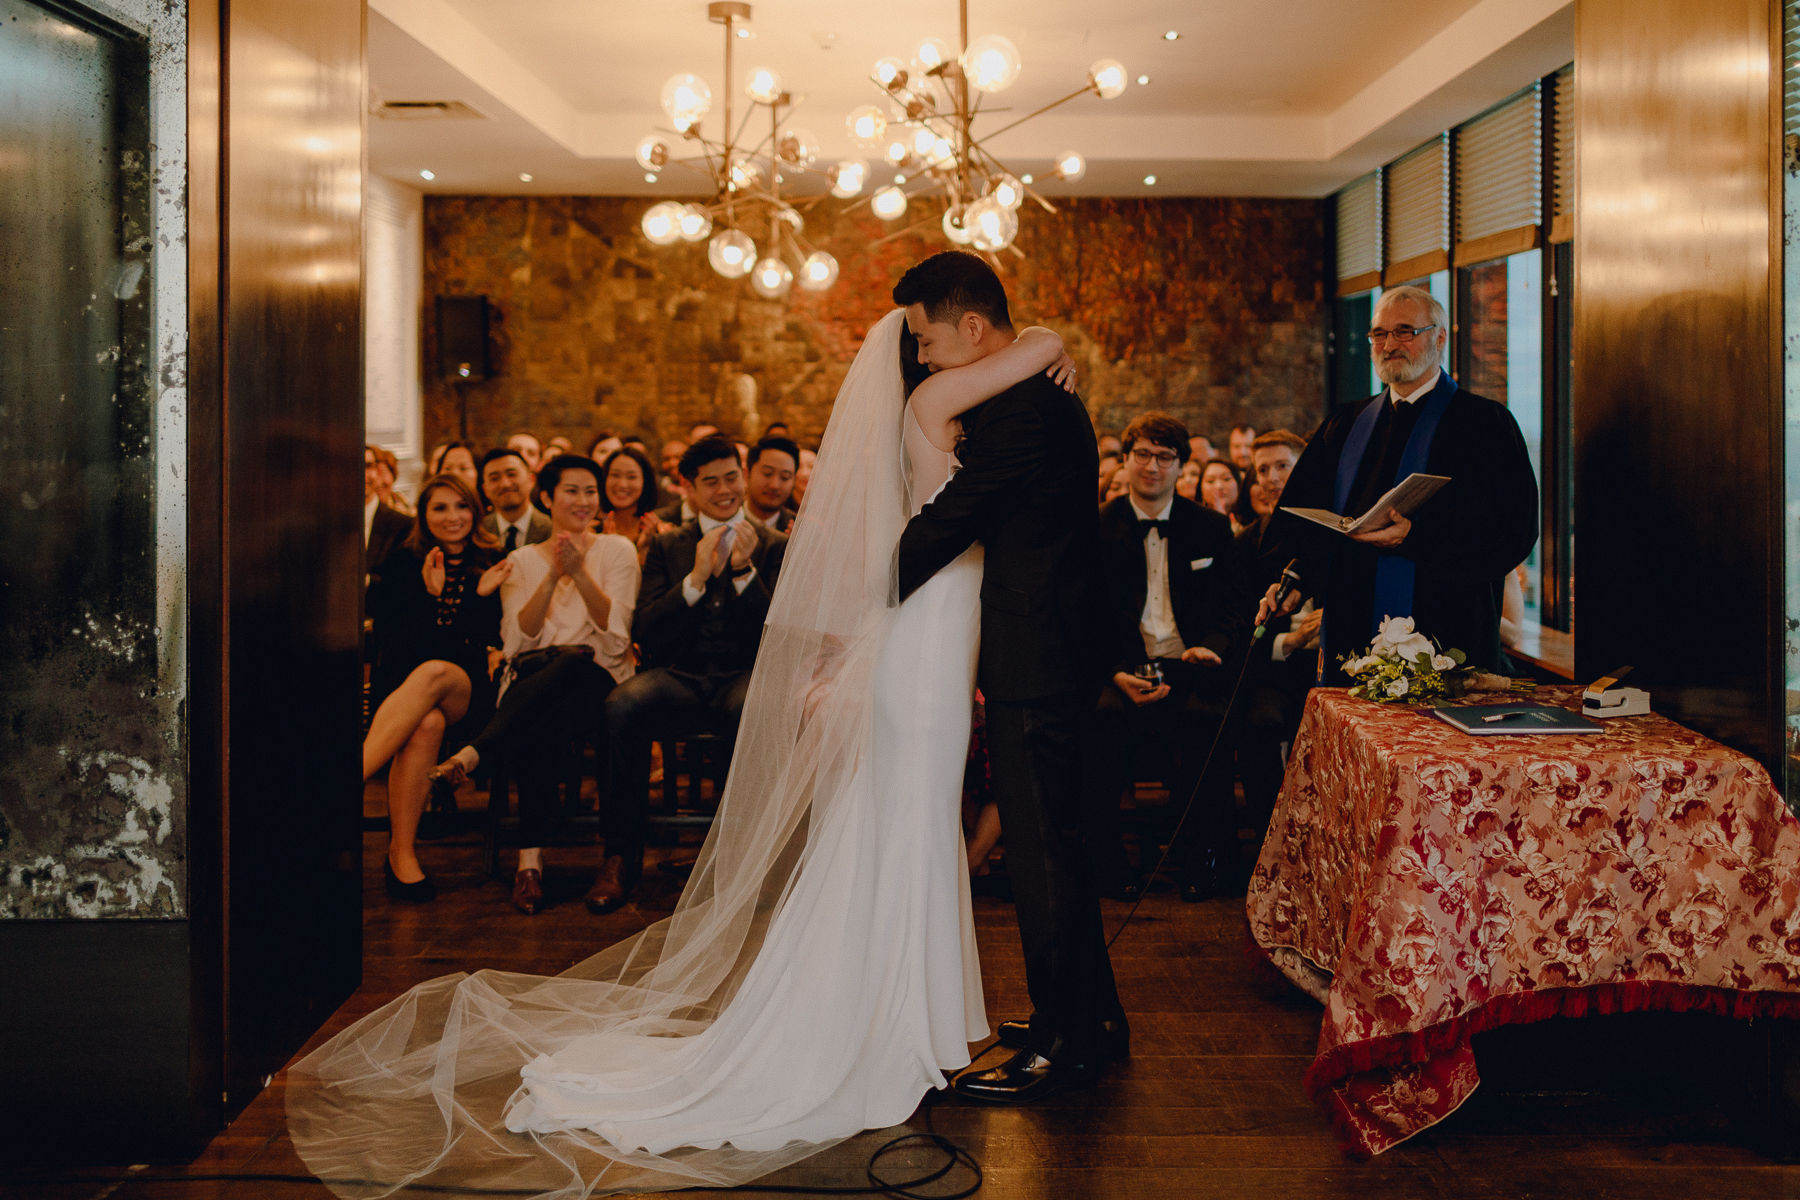 cannoe-restaurannt-wedding 0058.jpg